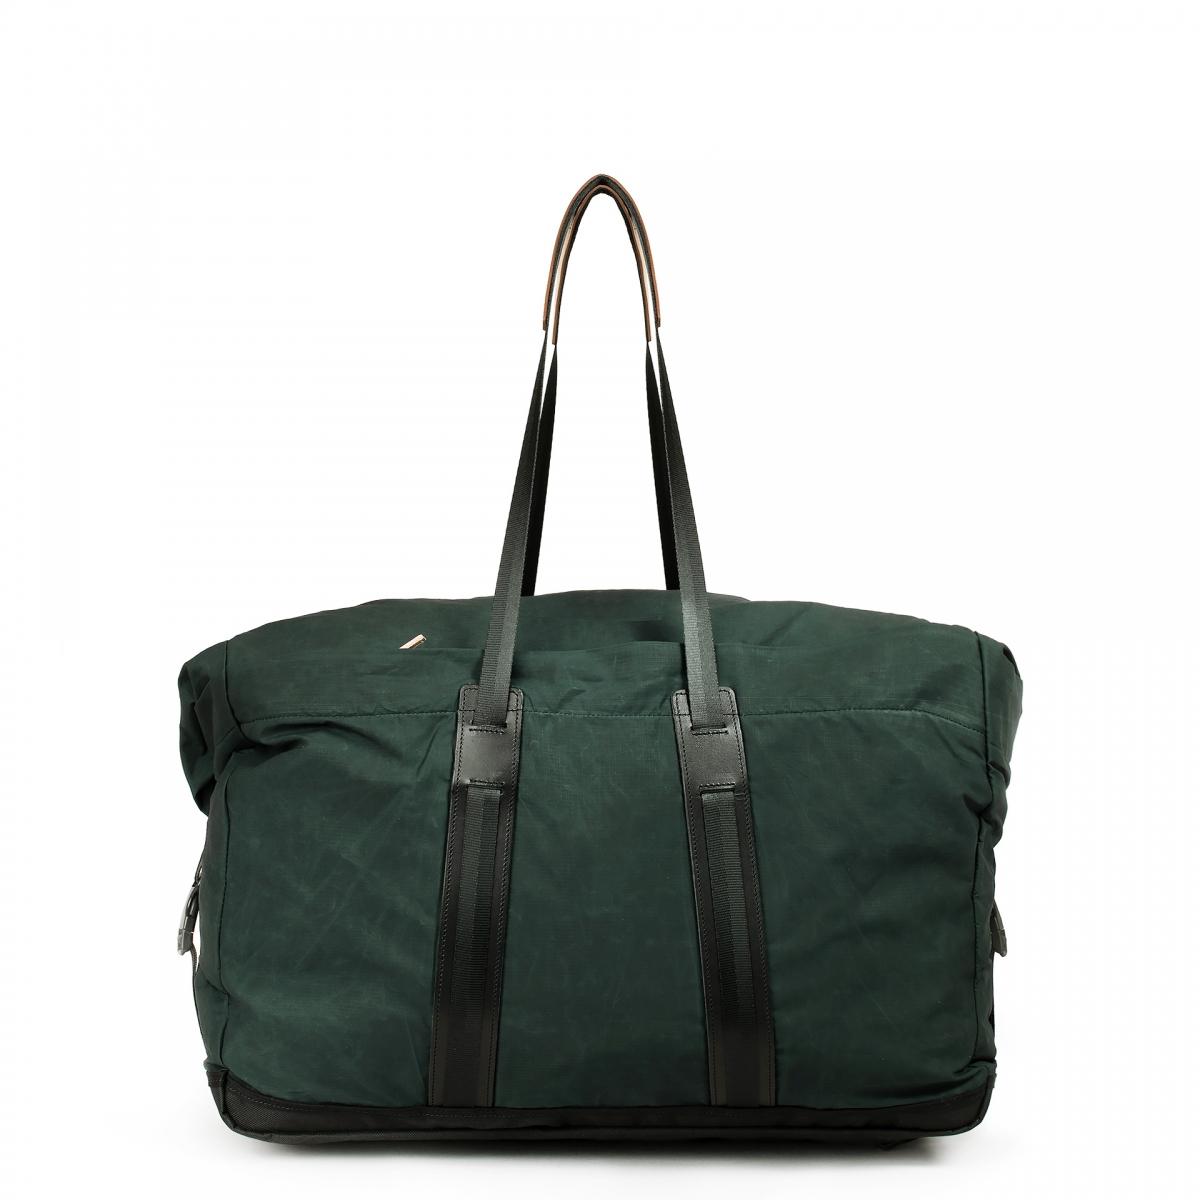 35L Baroud Travel bag - Dark Khaki (image n°3)